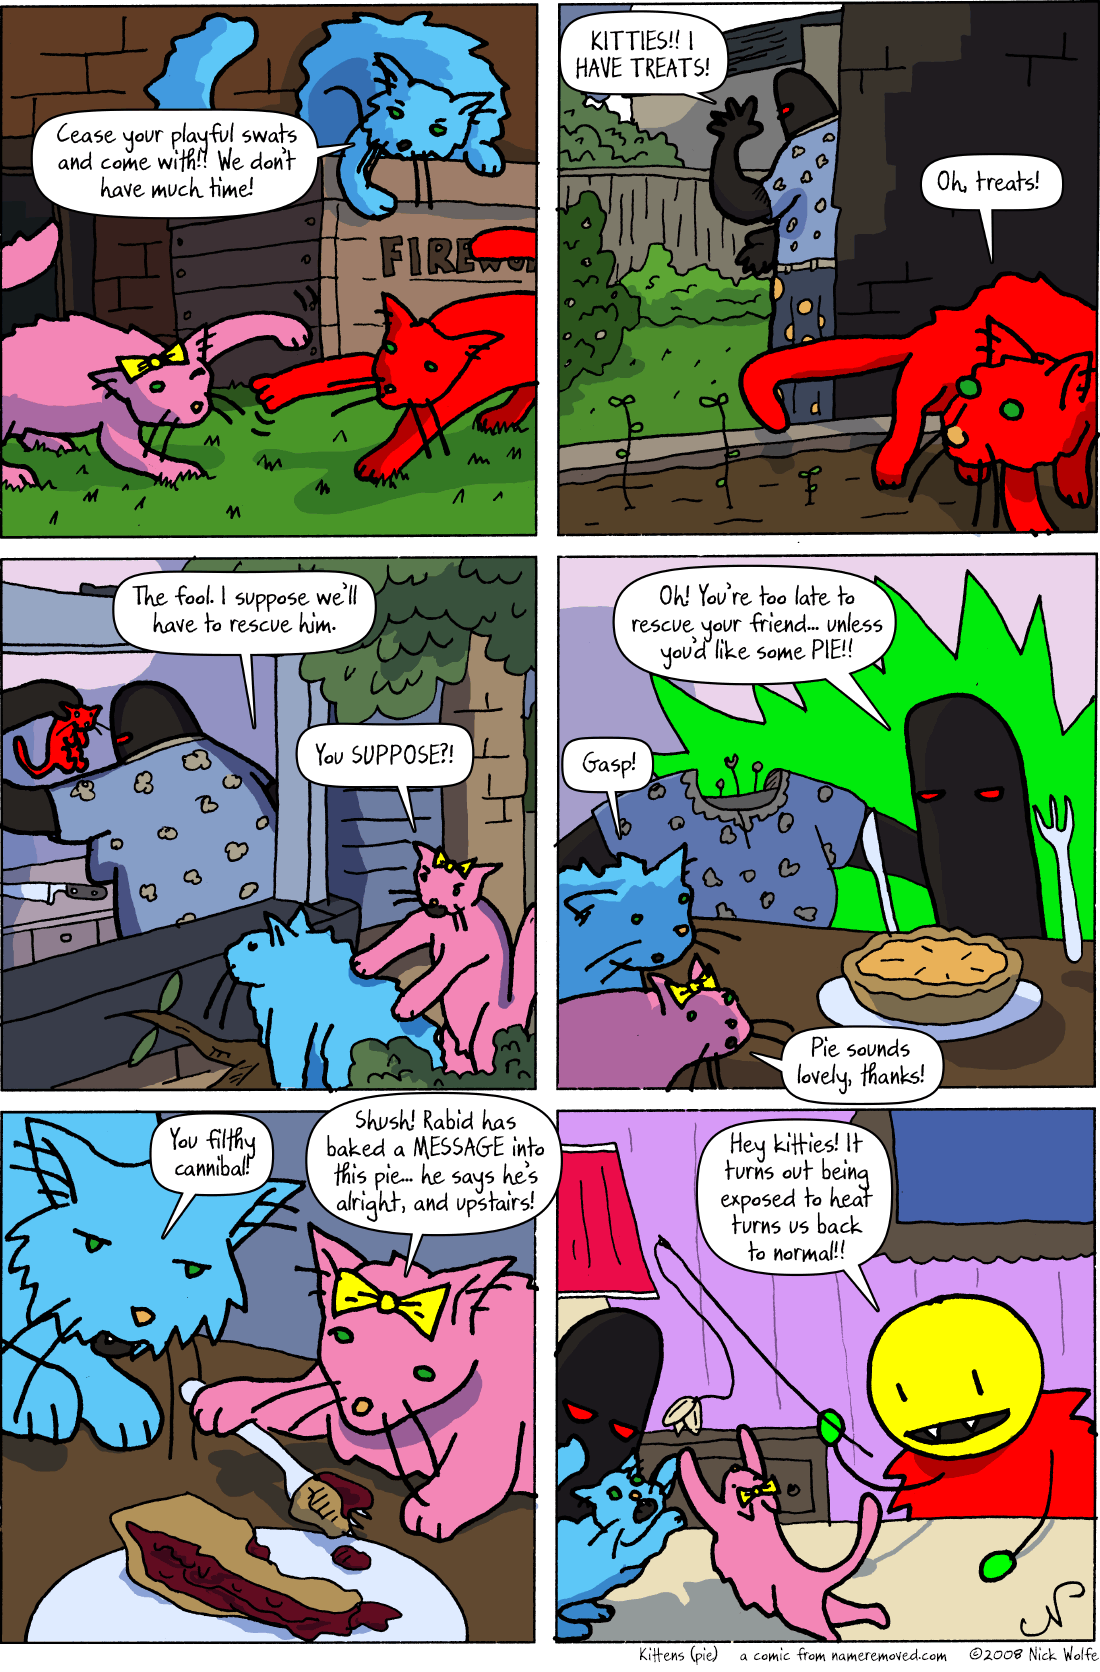 Kittens (pie)